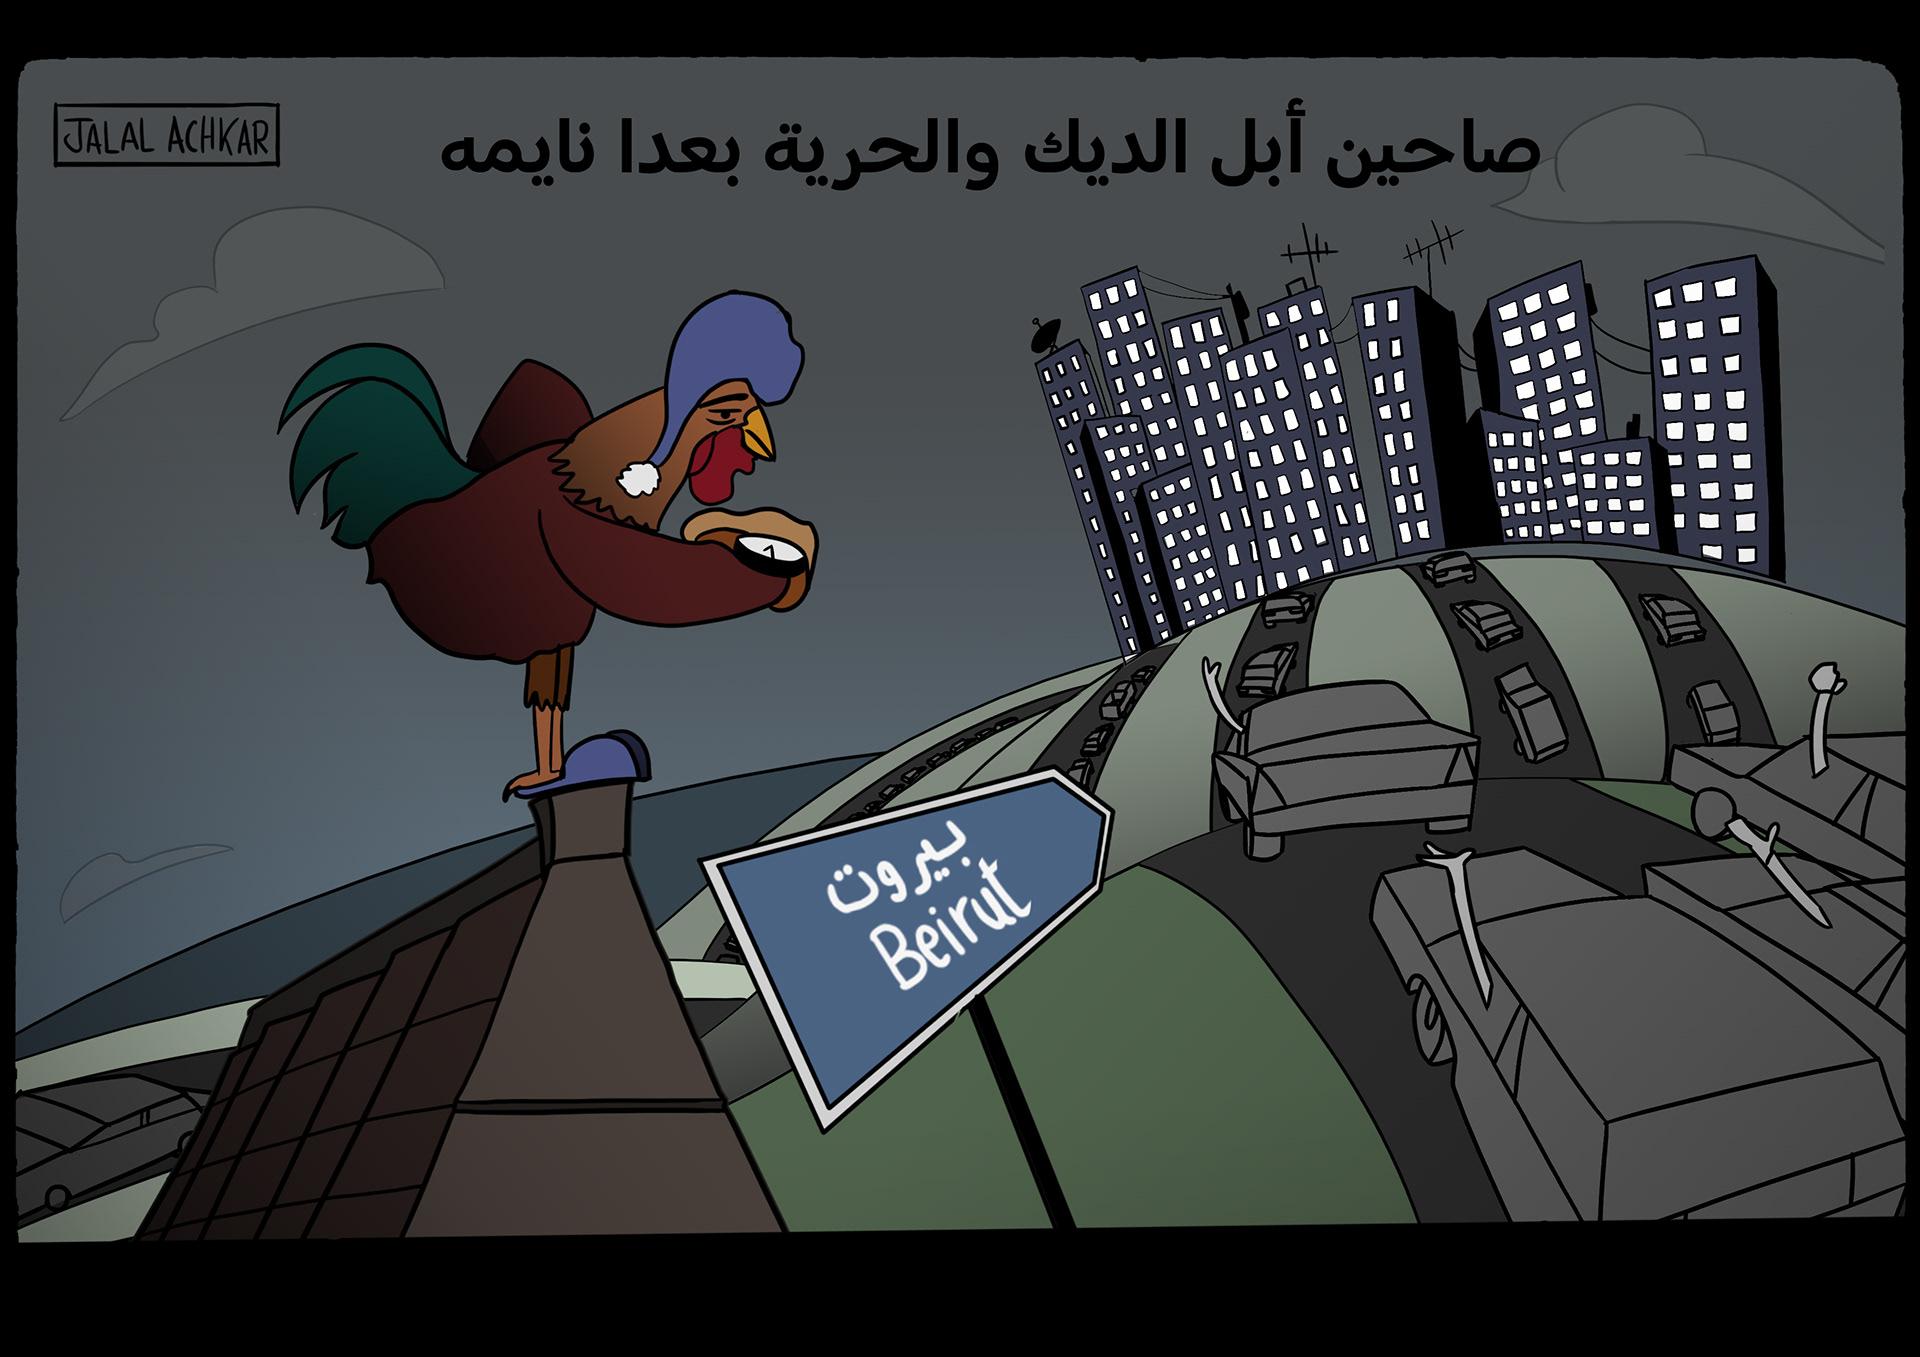 Jalal Achkar - Freedom in Lebanon | Illustration